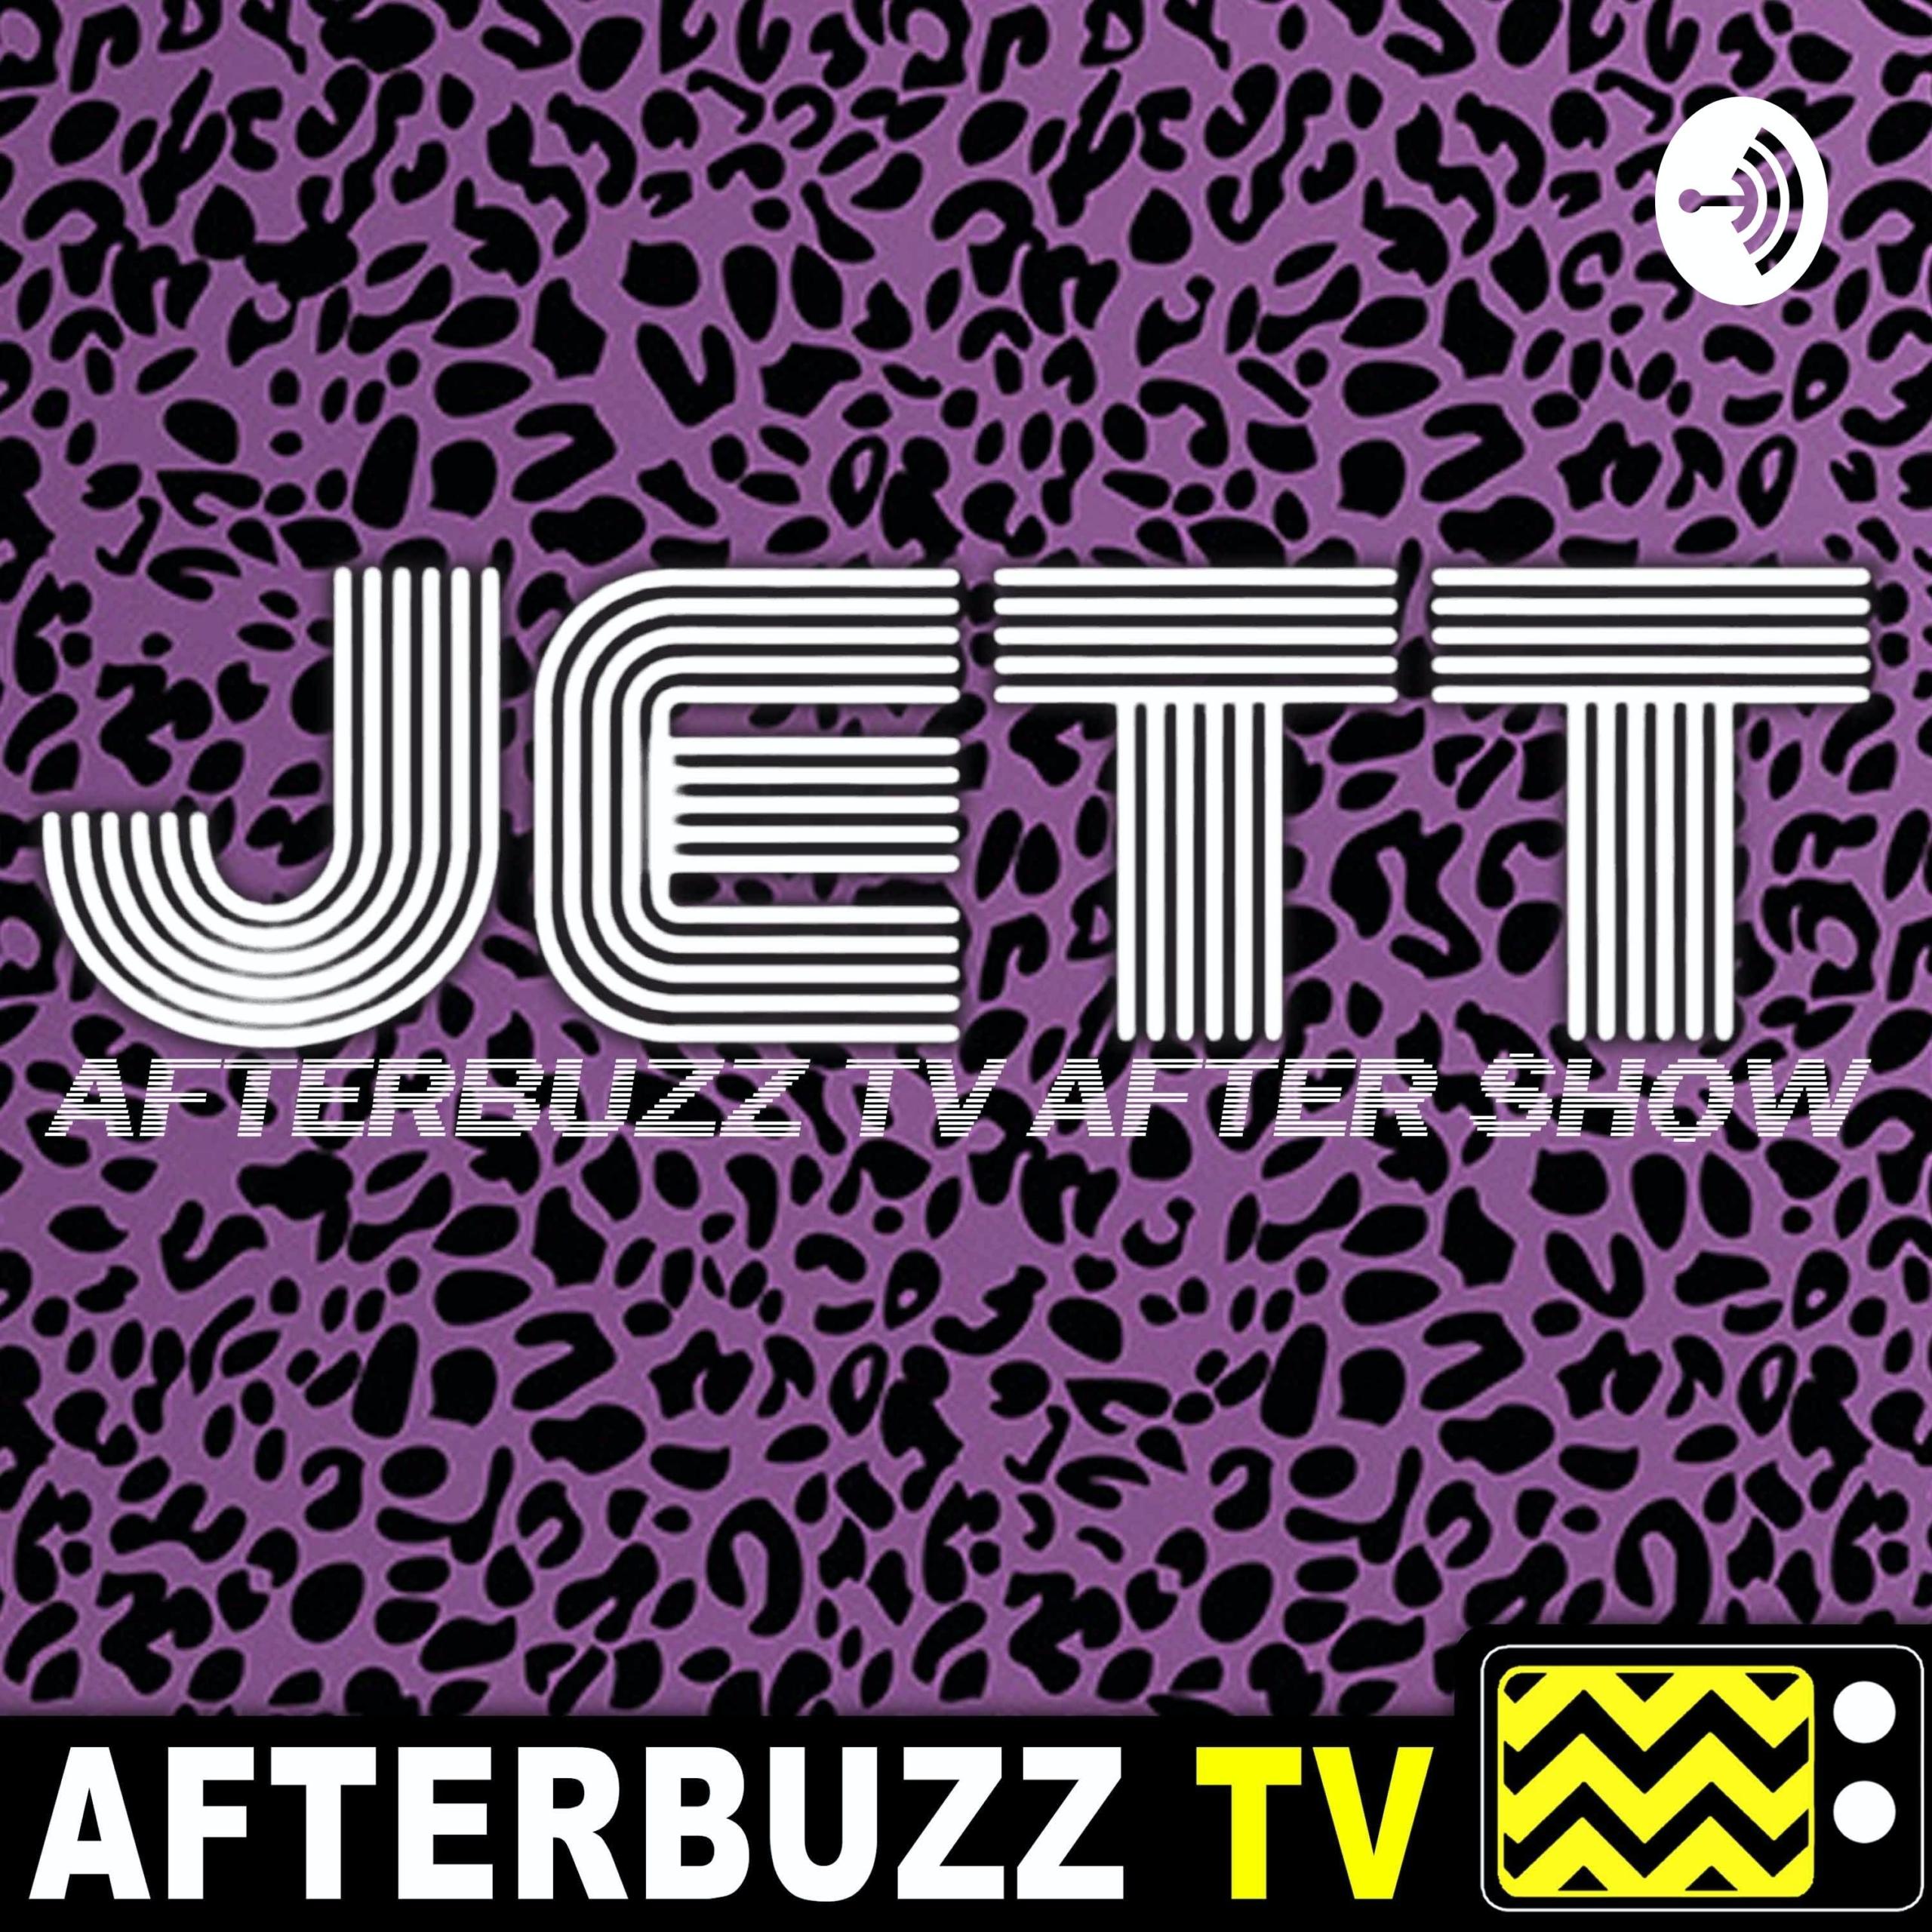 """Miljan Bestic"" Season 1 Episodes 9 'Jett' Review"